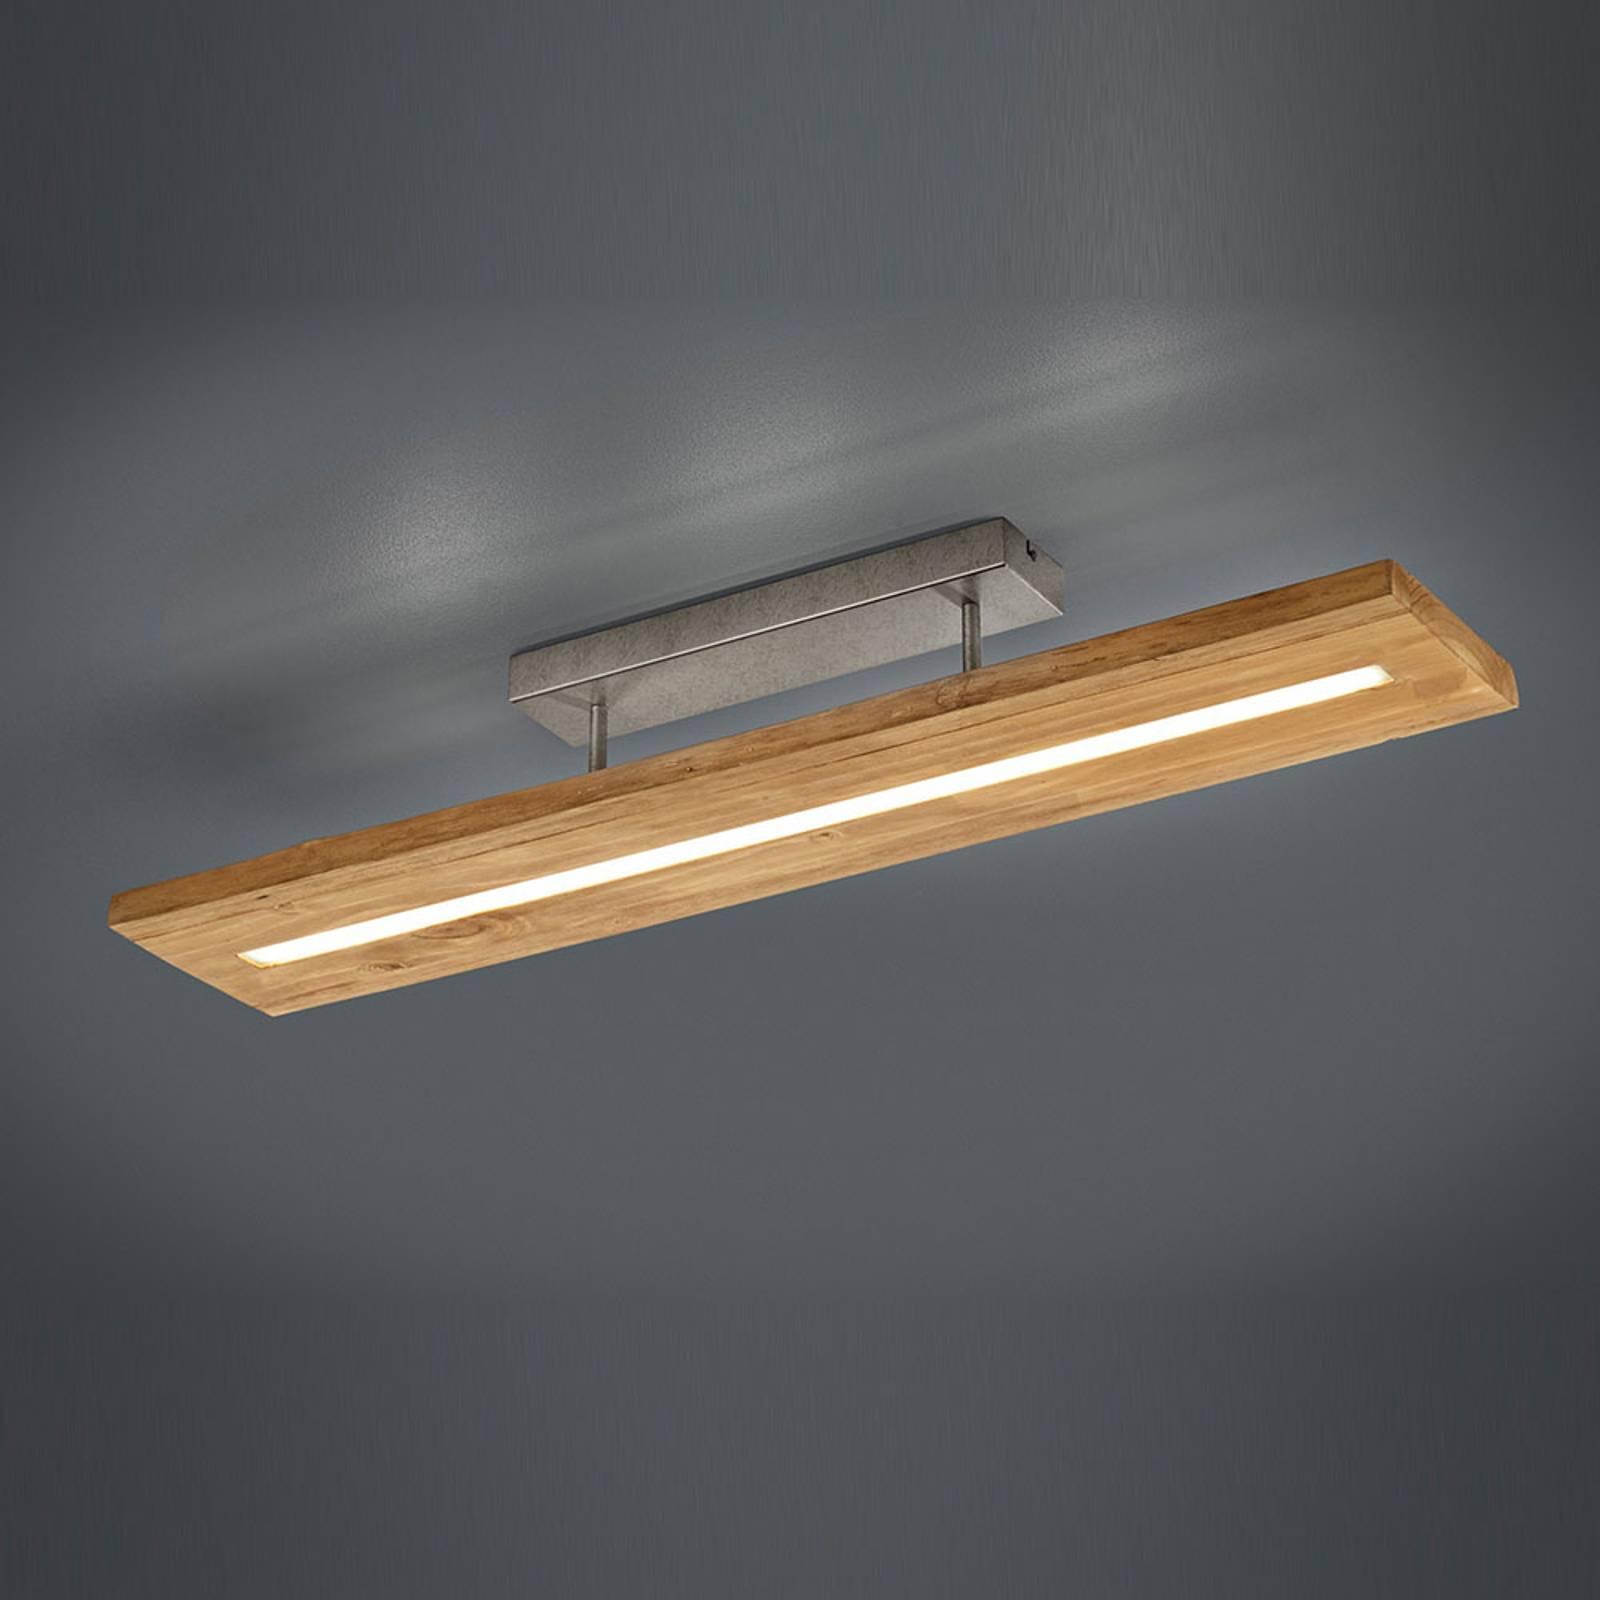 LED-kattovalaisin Brad puusta